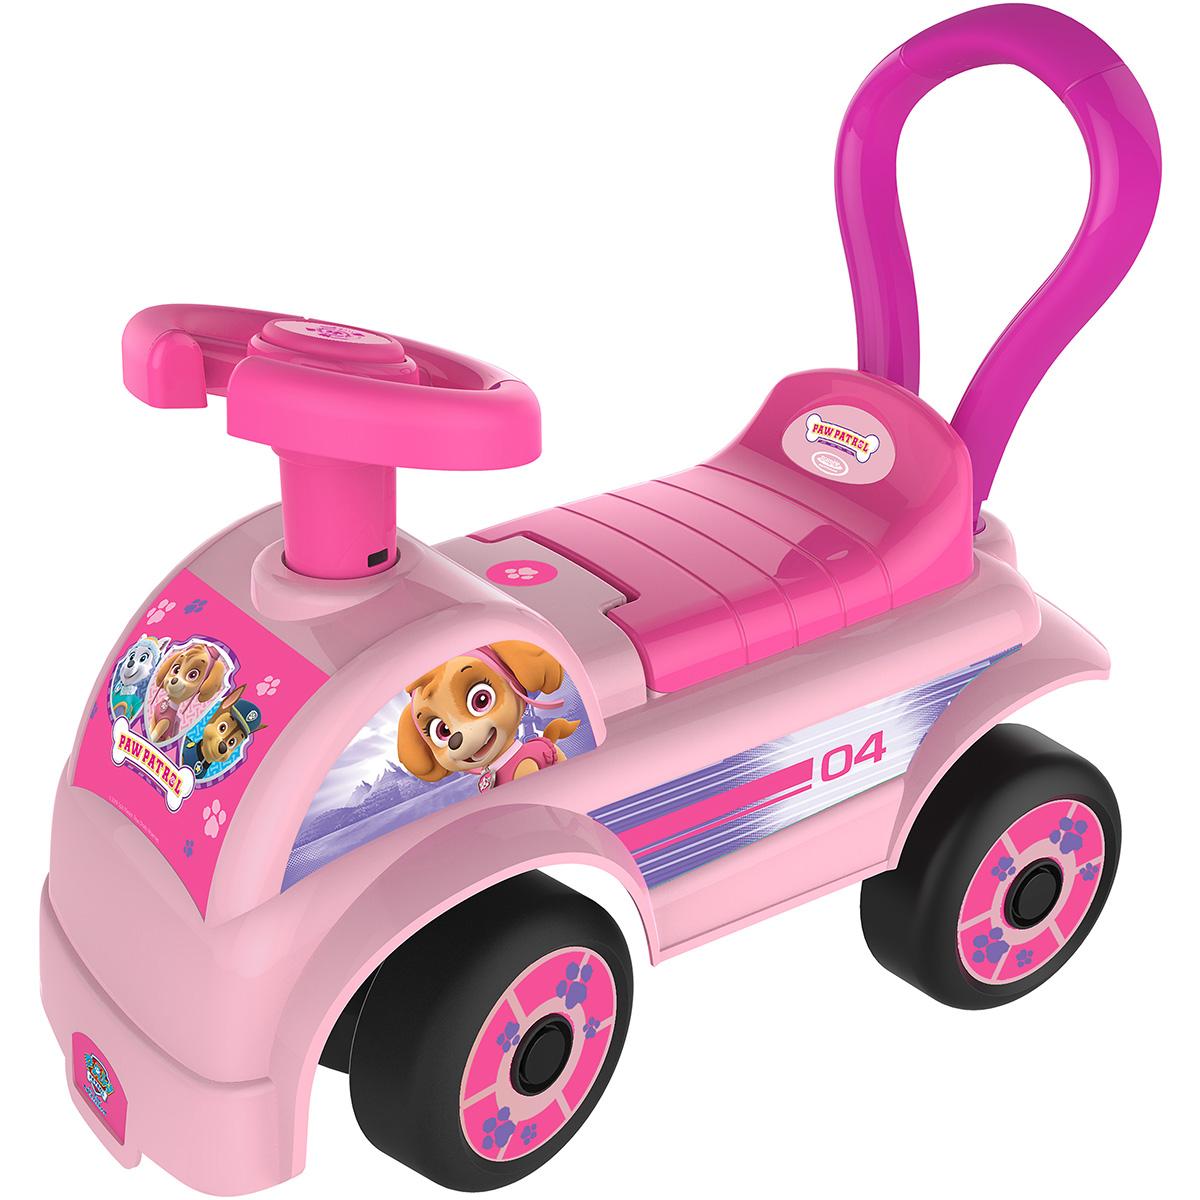 Masinuta fara pedale Paw Patrol, My 1st Ride On, Roz imagine